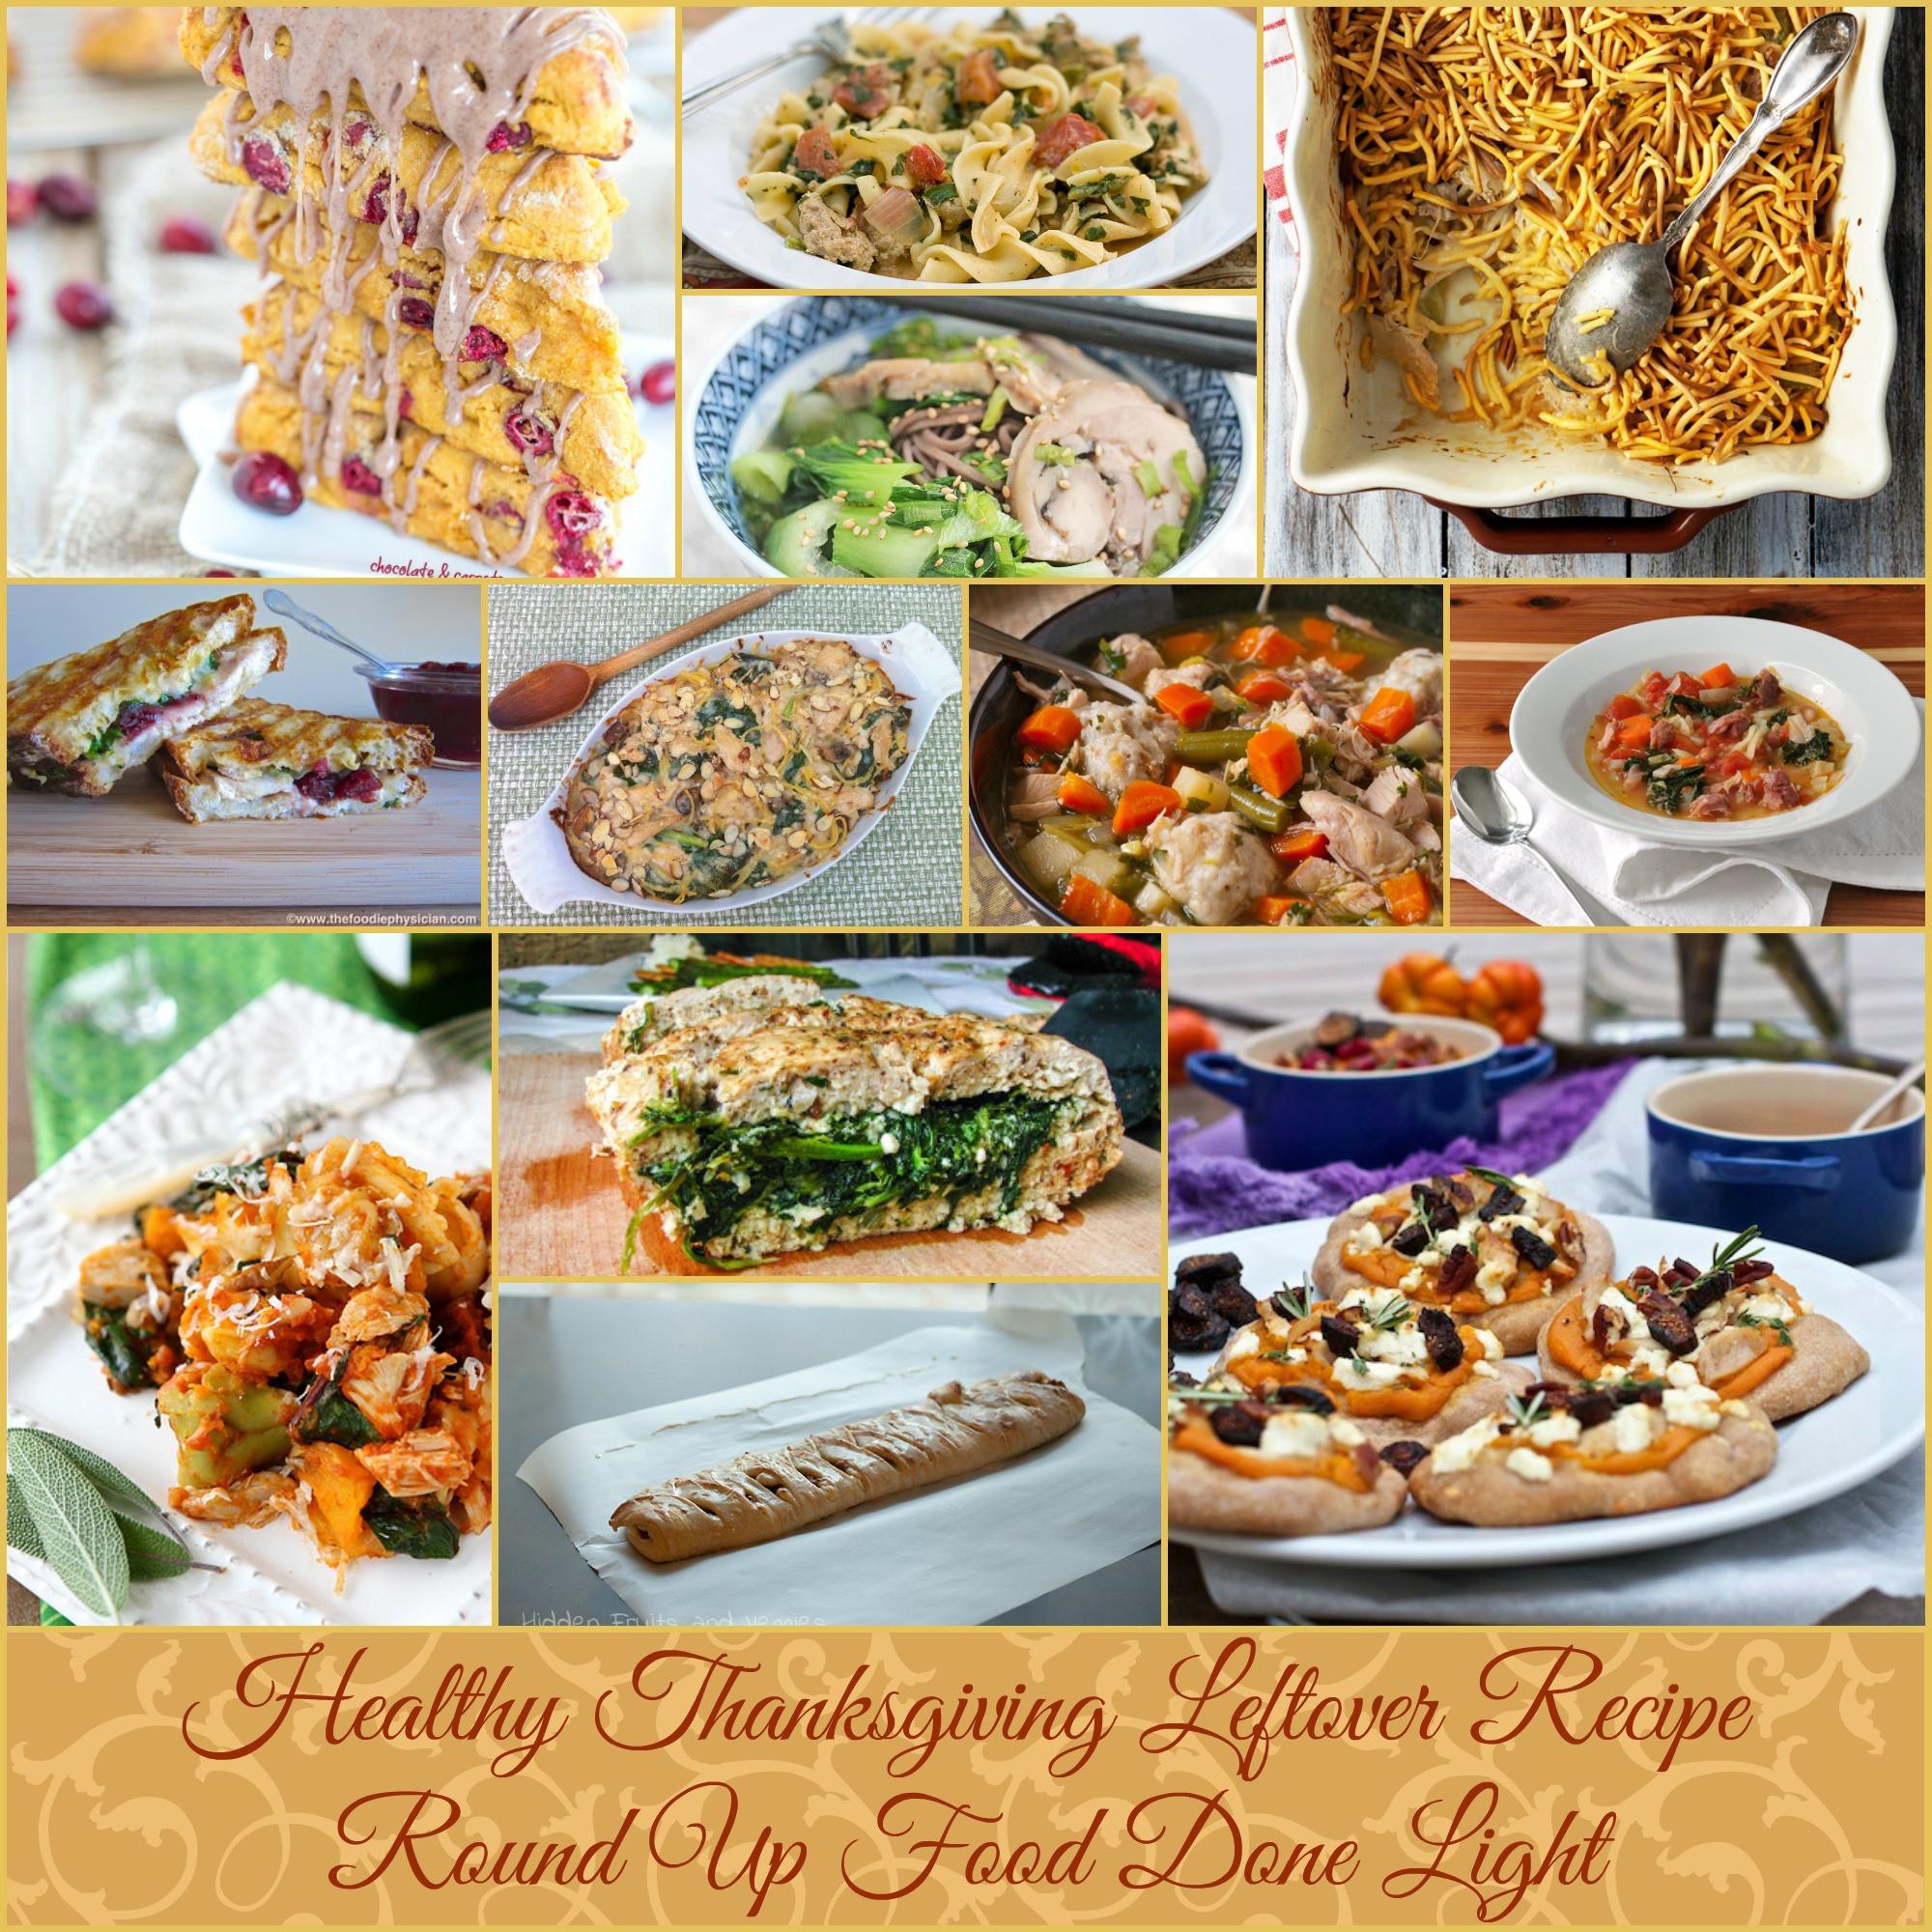 Healthy Thanksgiving Food  Healthy Thanksgiving Leftover Recipe Round Up